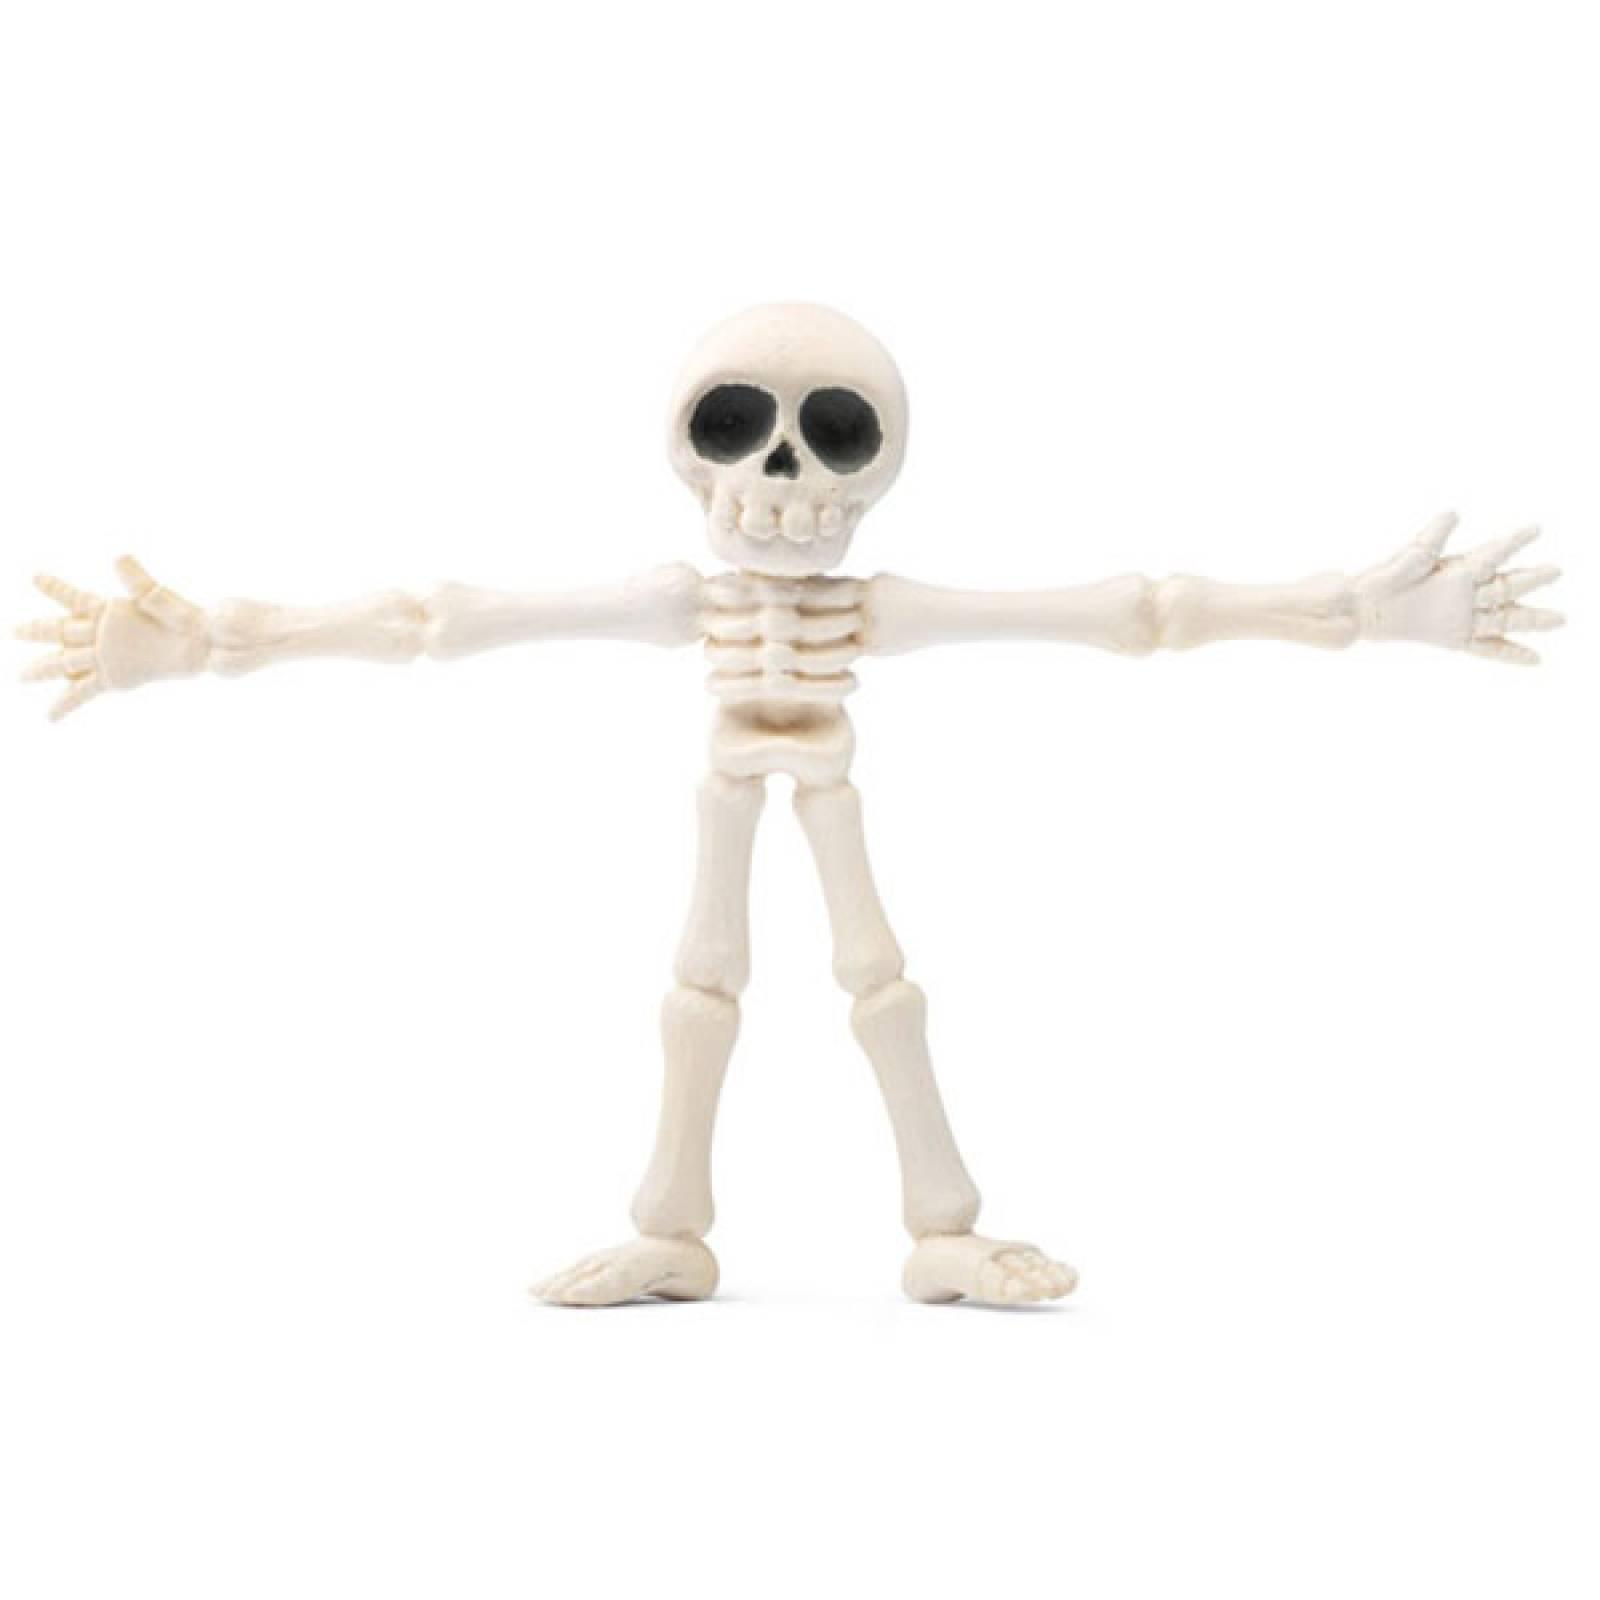 Flexi Fright Bendy Walking Zombie Figure VARIOUS thumbnails